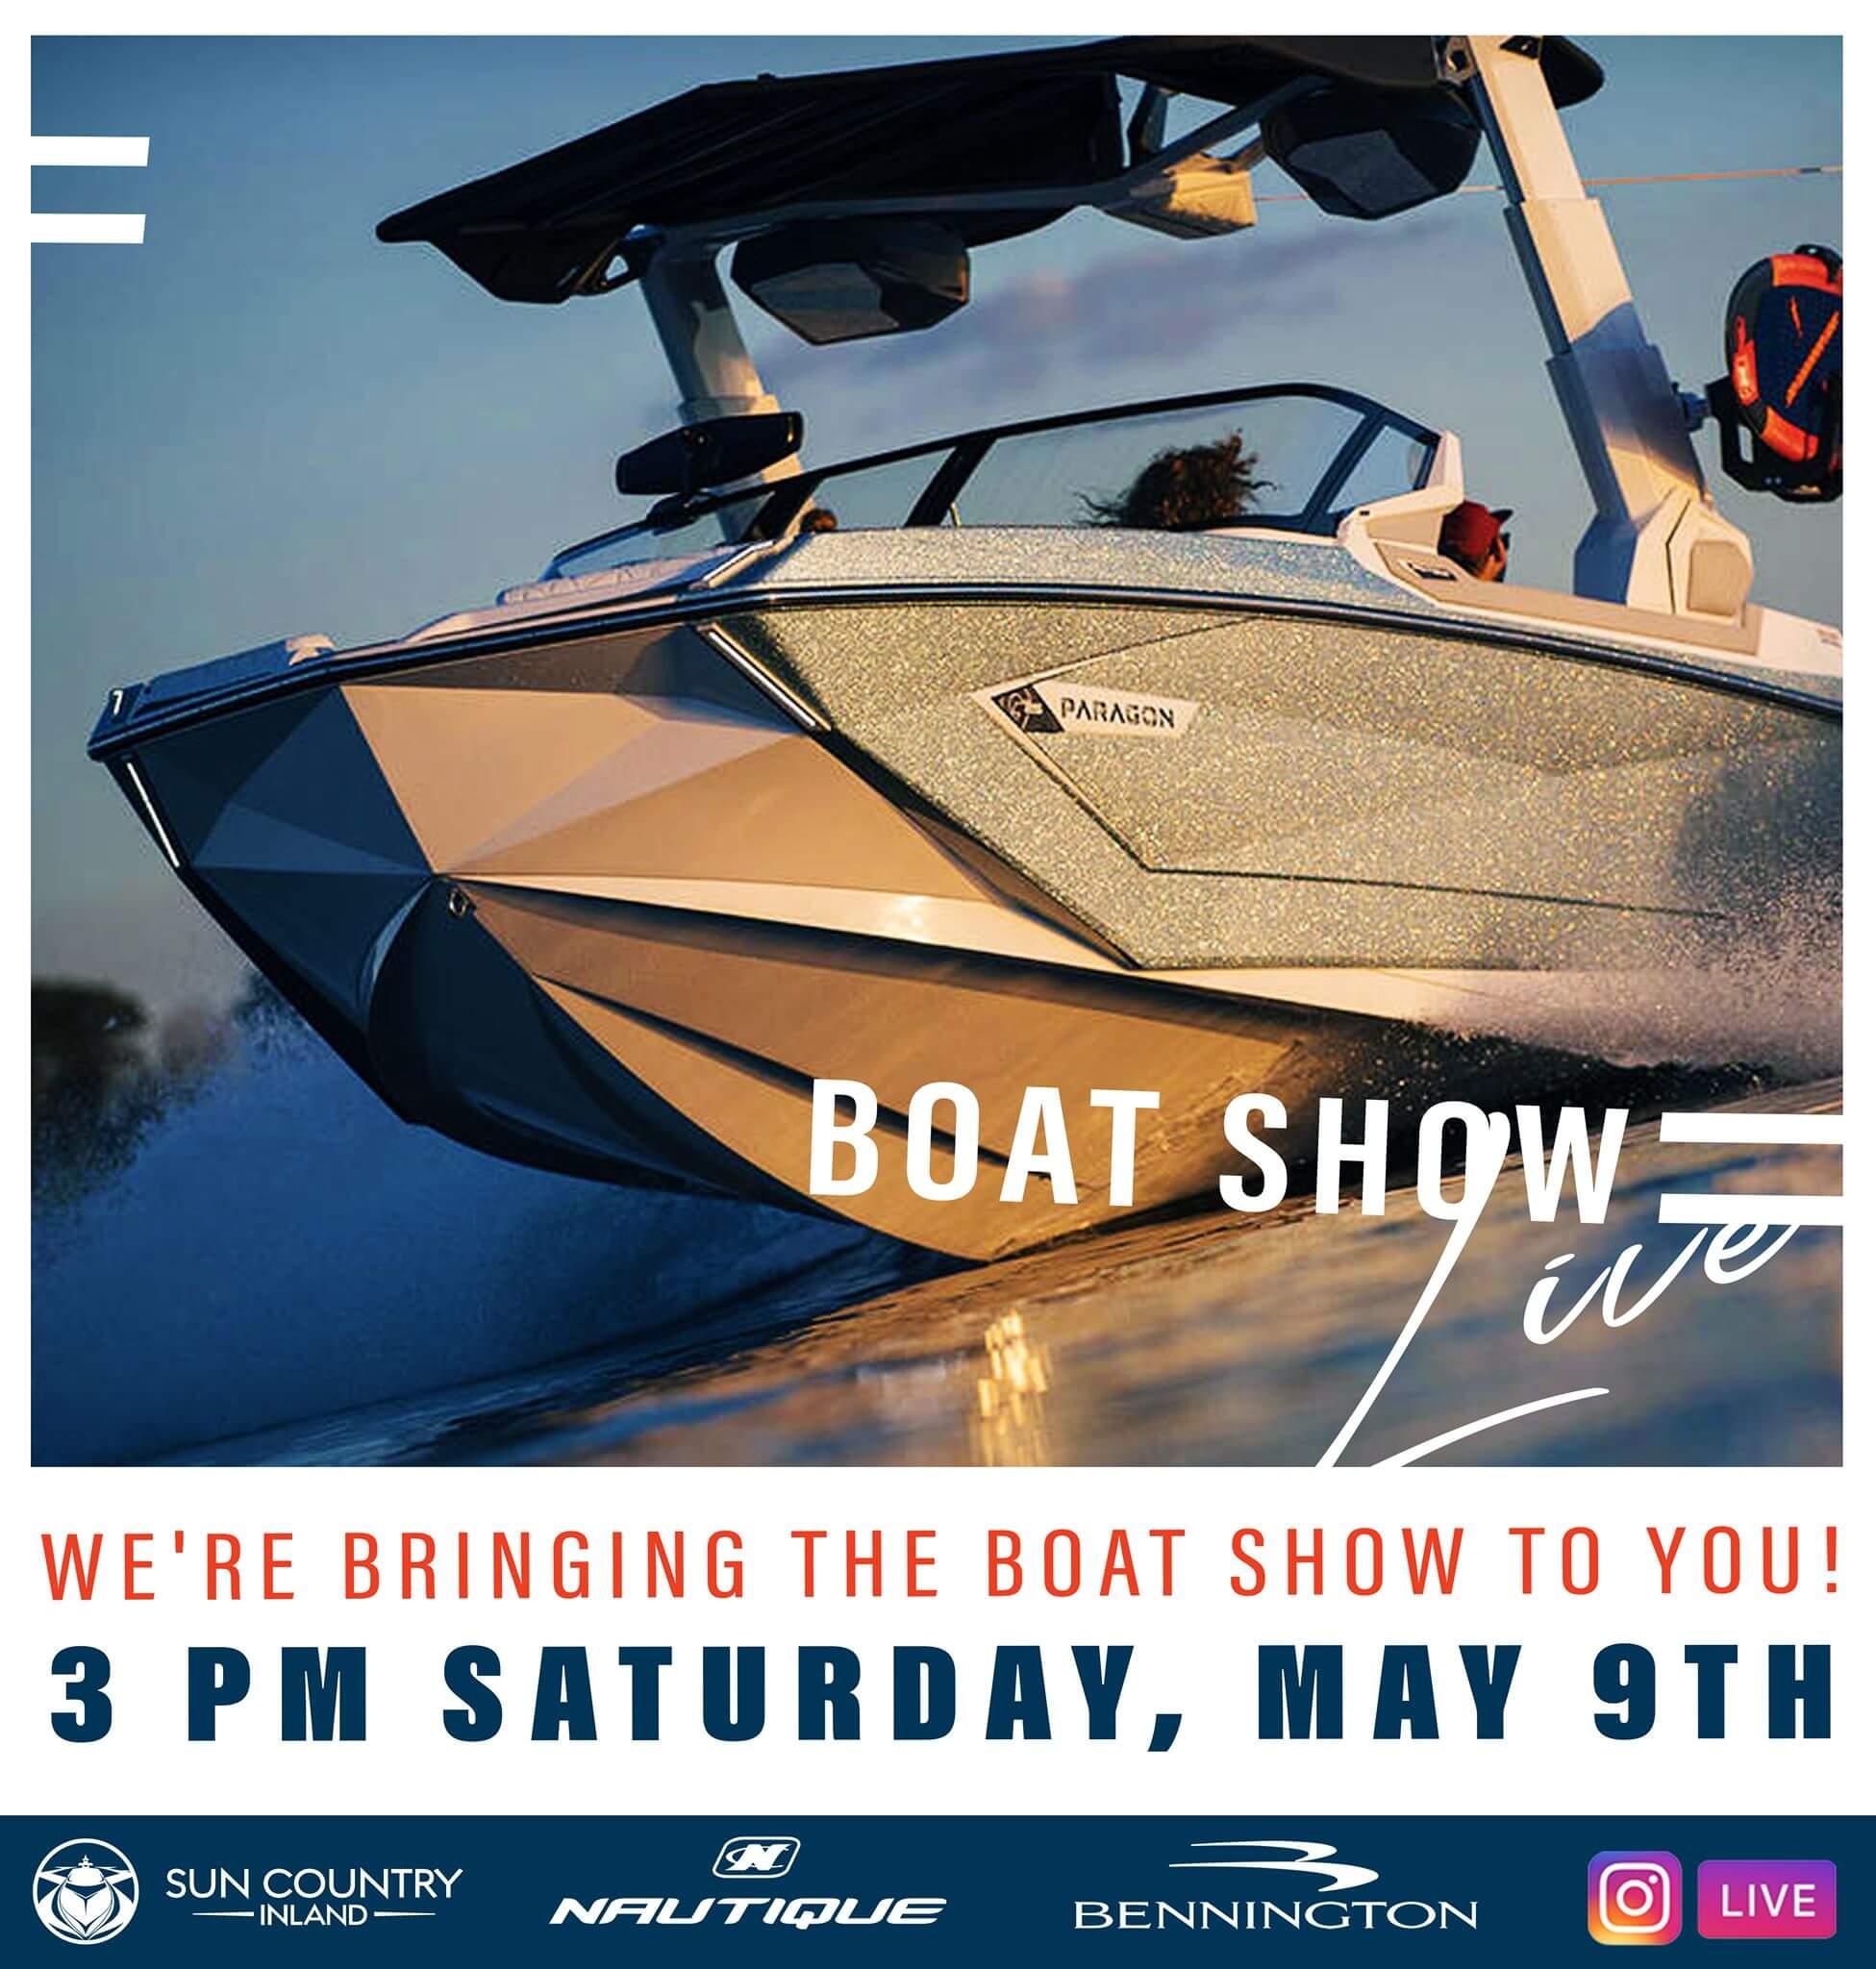 sci-05-09-2020-boatshow-live